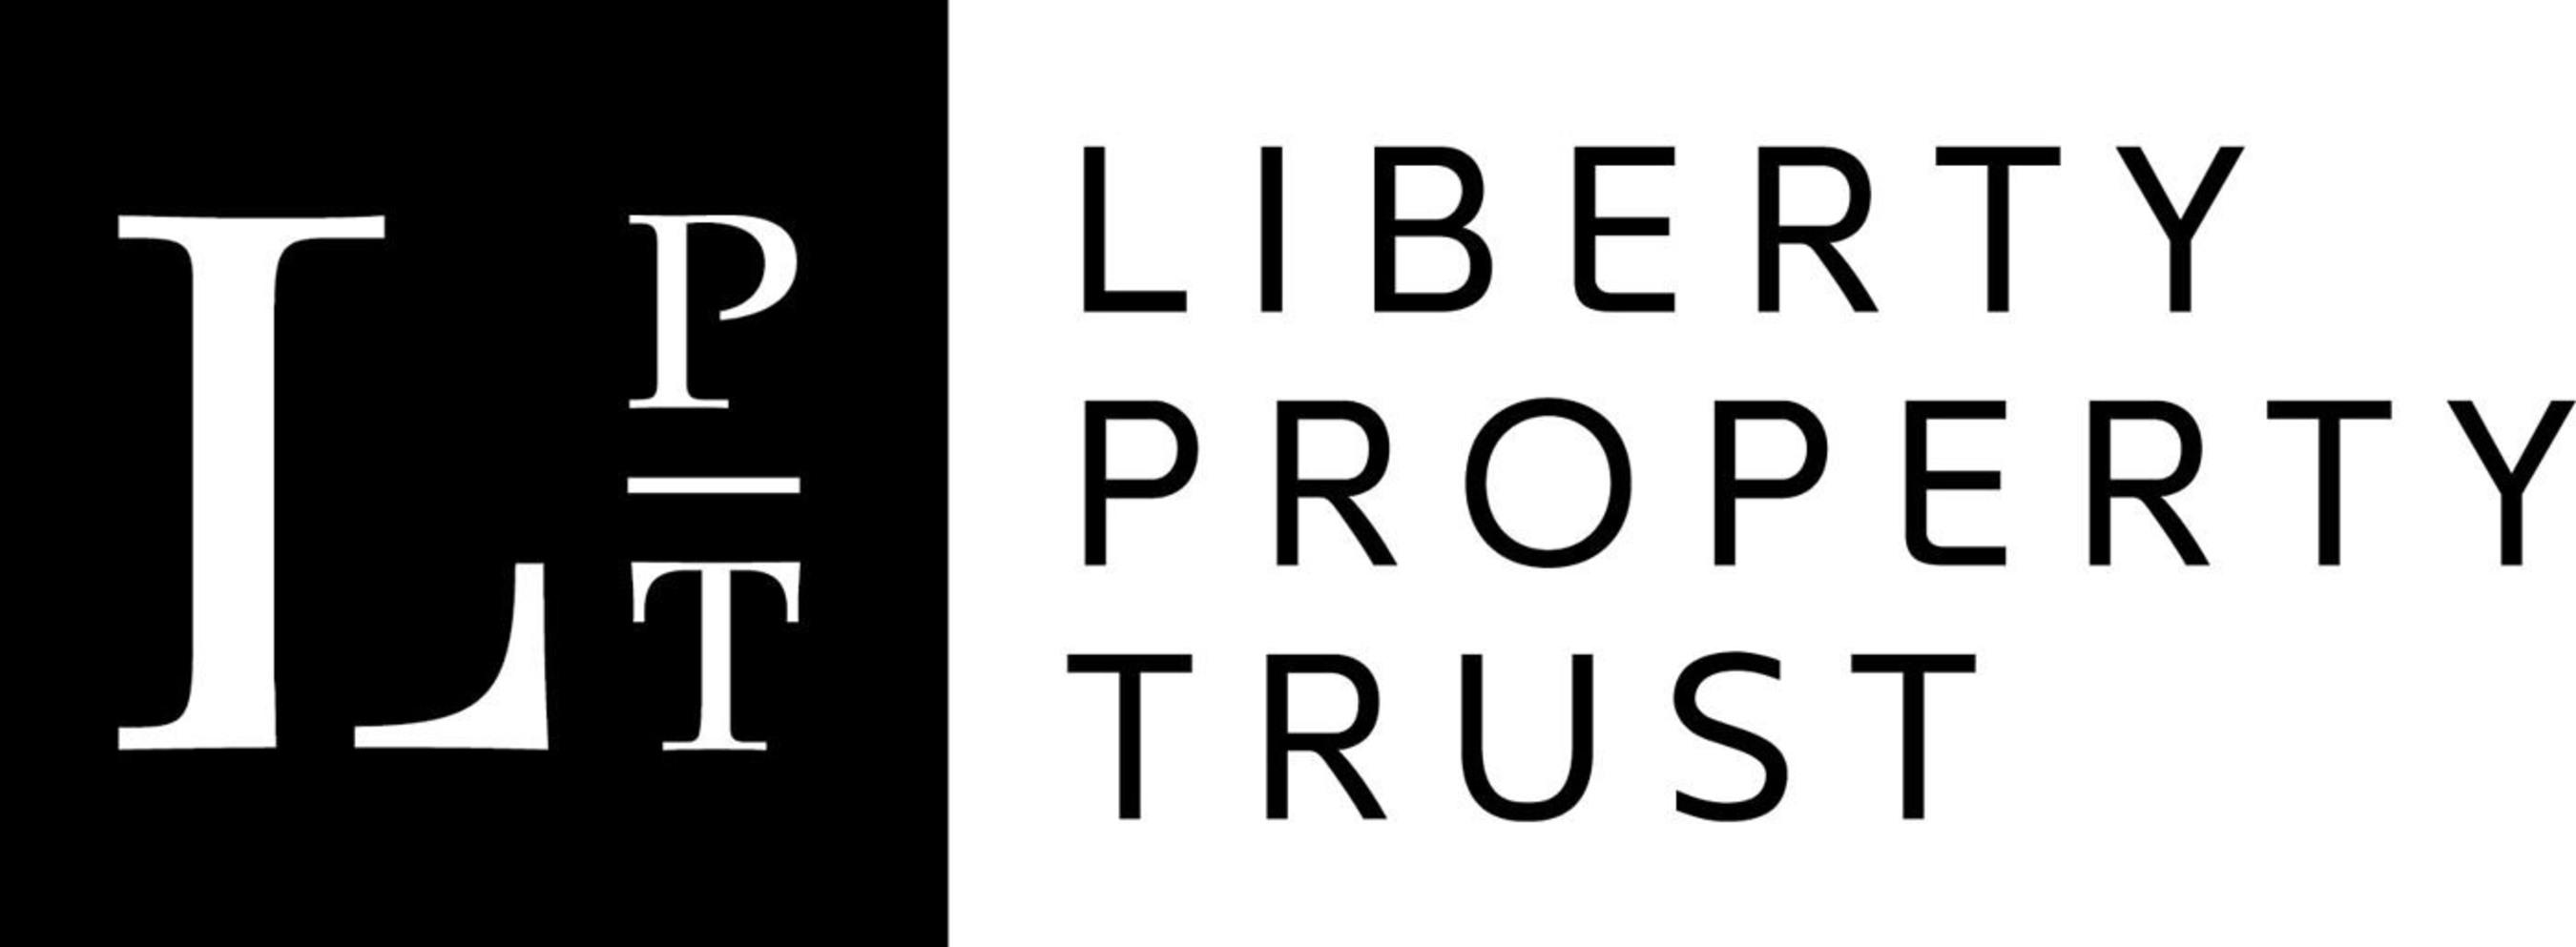 Liberty Property Trust logo. (PRNewsFoto/Liberty Property Trust) (PRNewsFoto/LIBERTY PROPERTY TRUST)